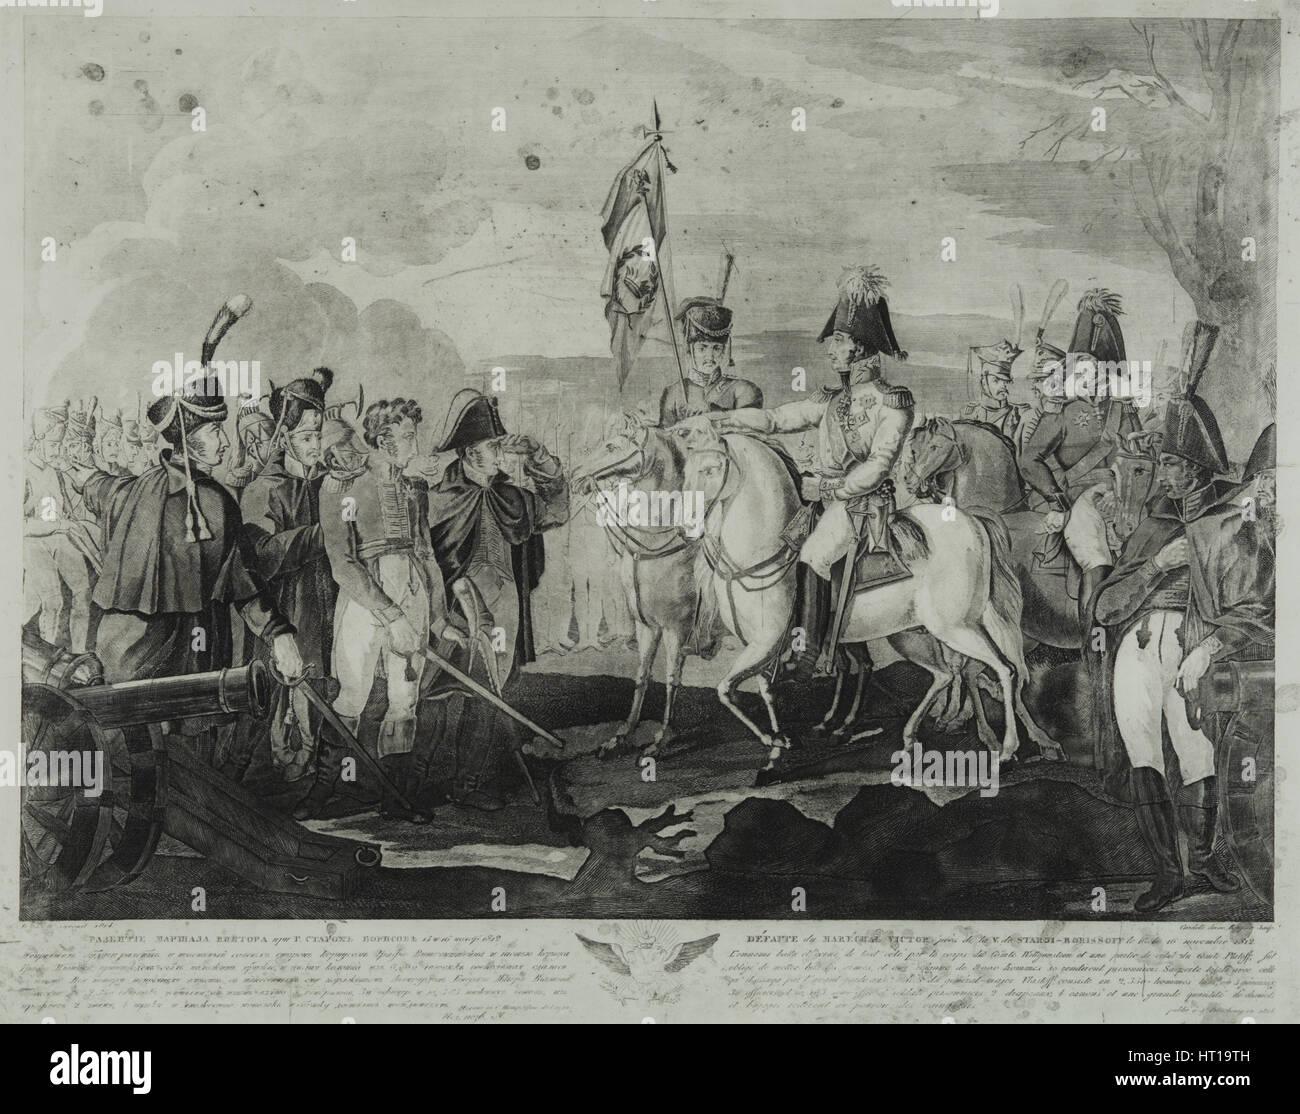 The Defeat of Marshal Victor near Borisov in November 1812, 1814. Artist: Cardelli, Salvatore (active 1800s) - Stock Image